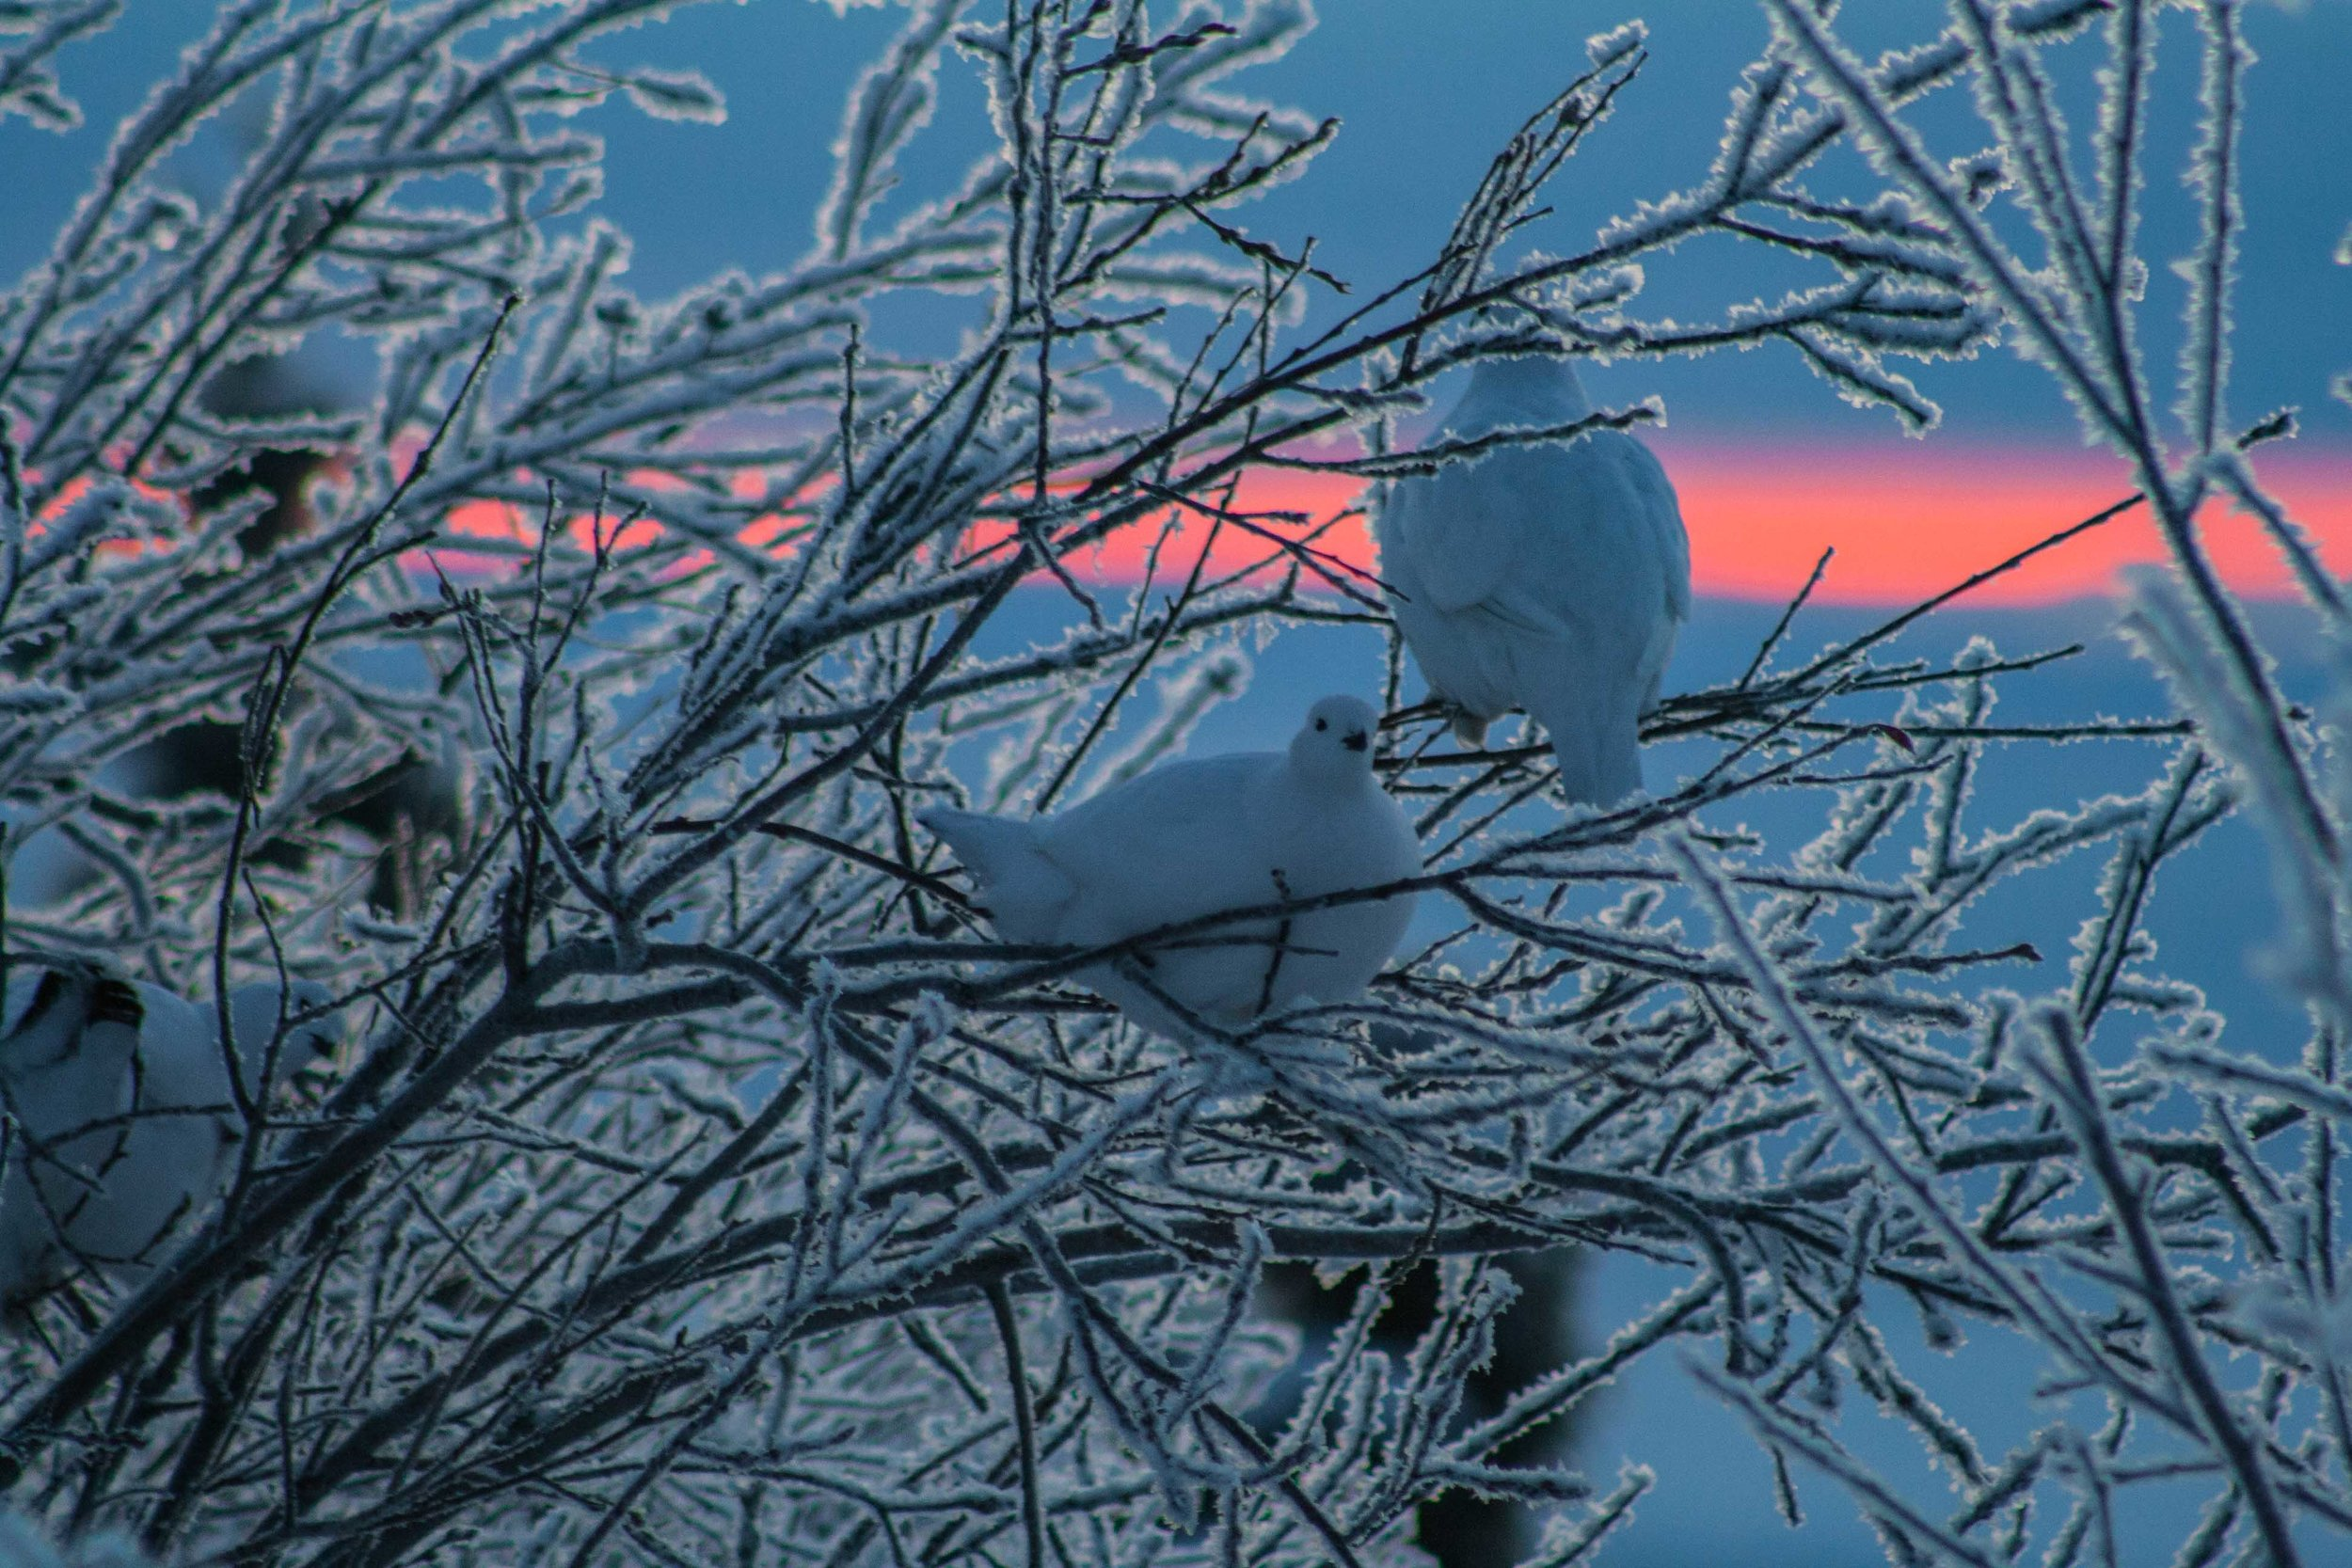 Fairbanks, Alaska. December 2015